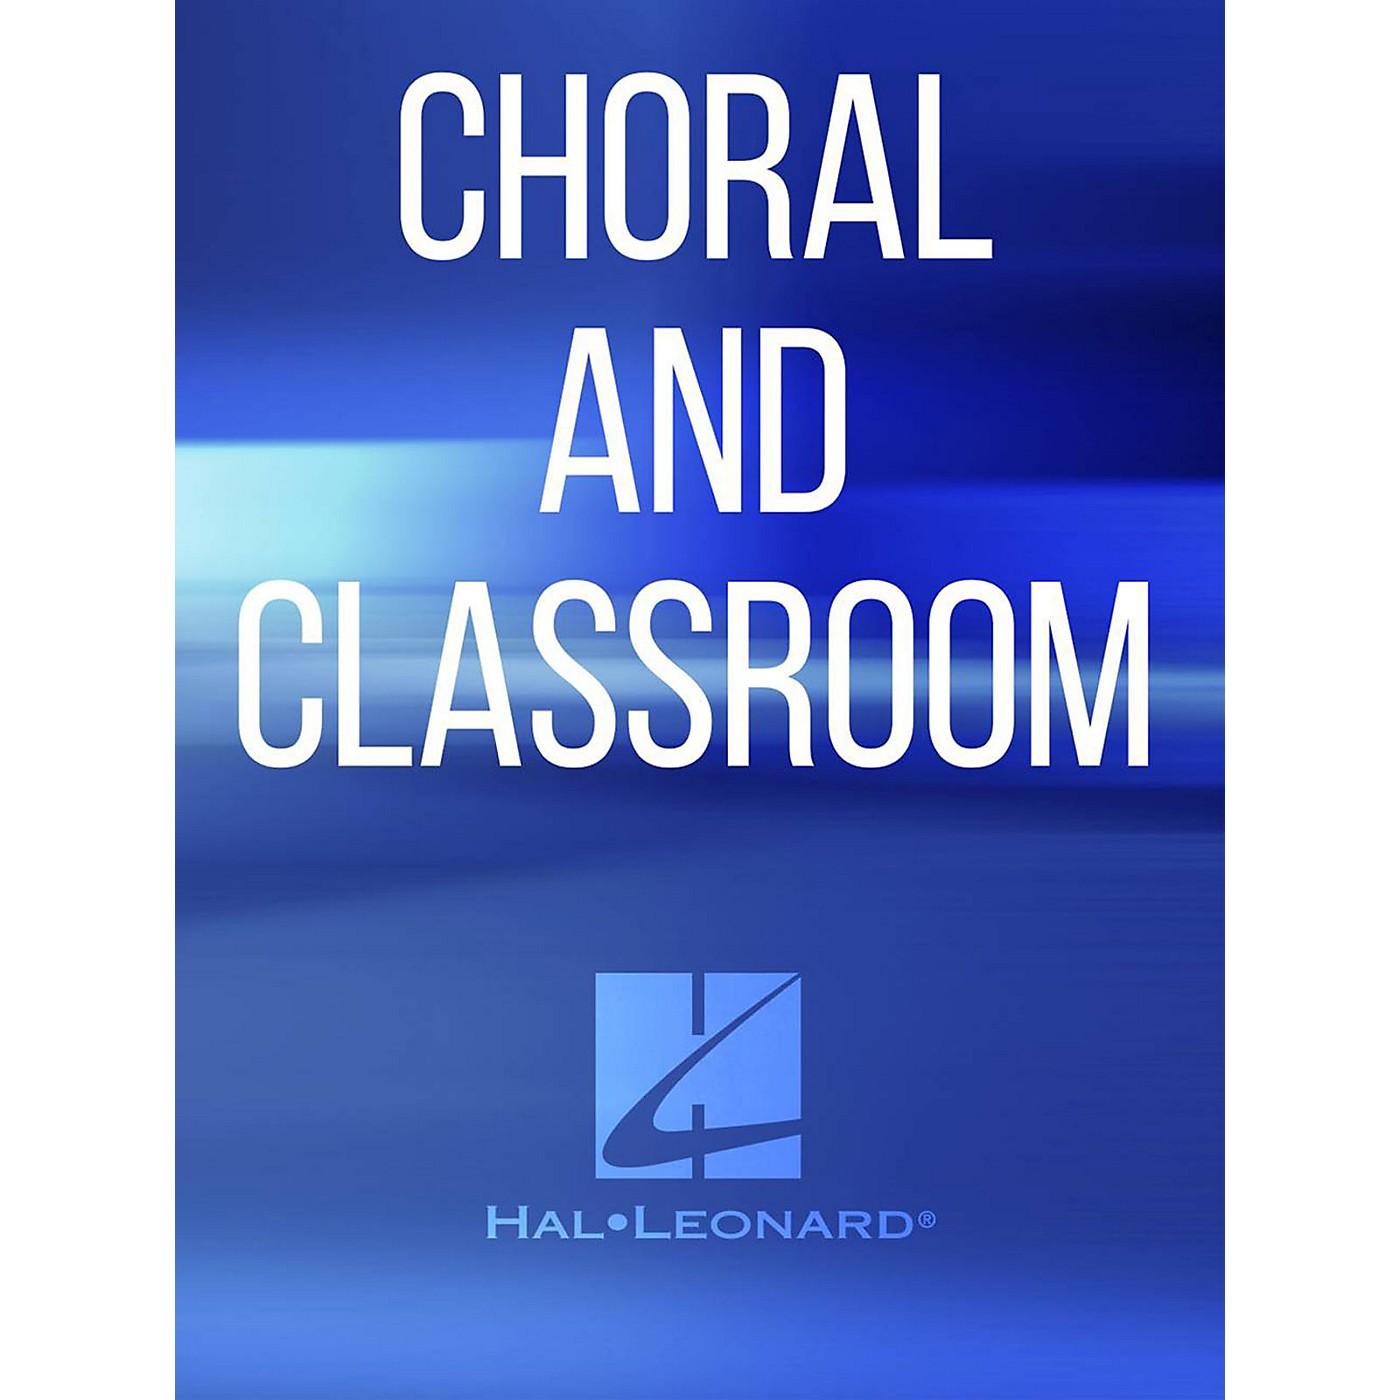 Hal Leonard Dies Irae SATB Composed by Carlos Santelli thumbnail